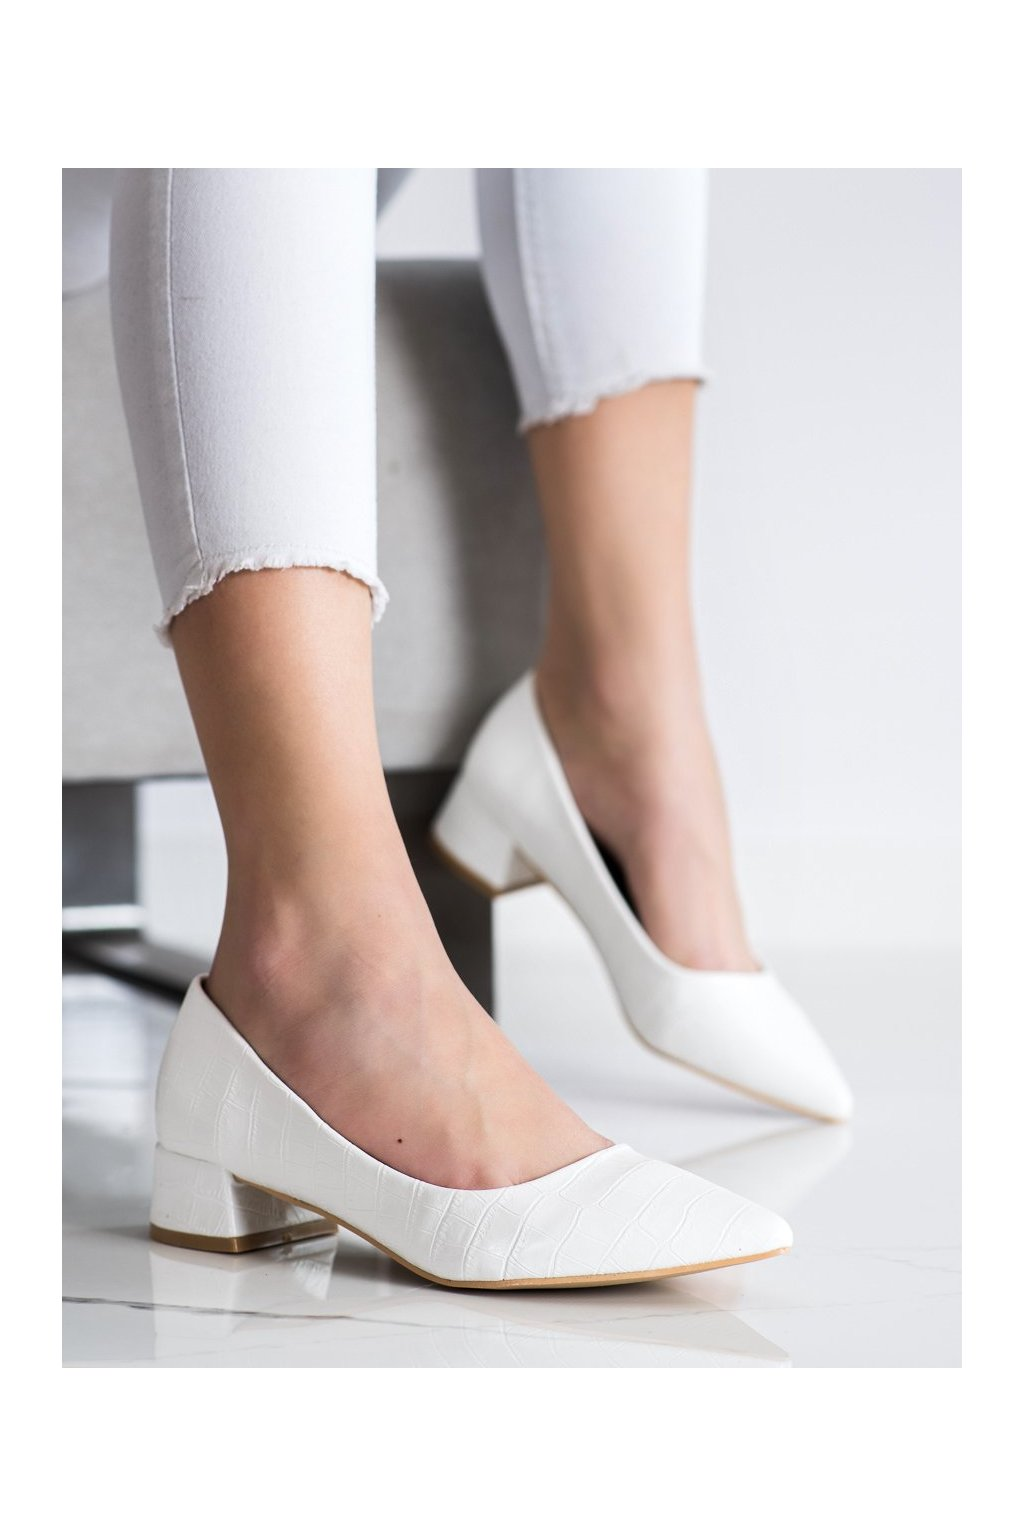 Biele dámske lodičky Sweet shoes kod 3845W